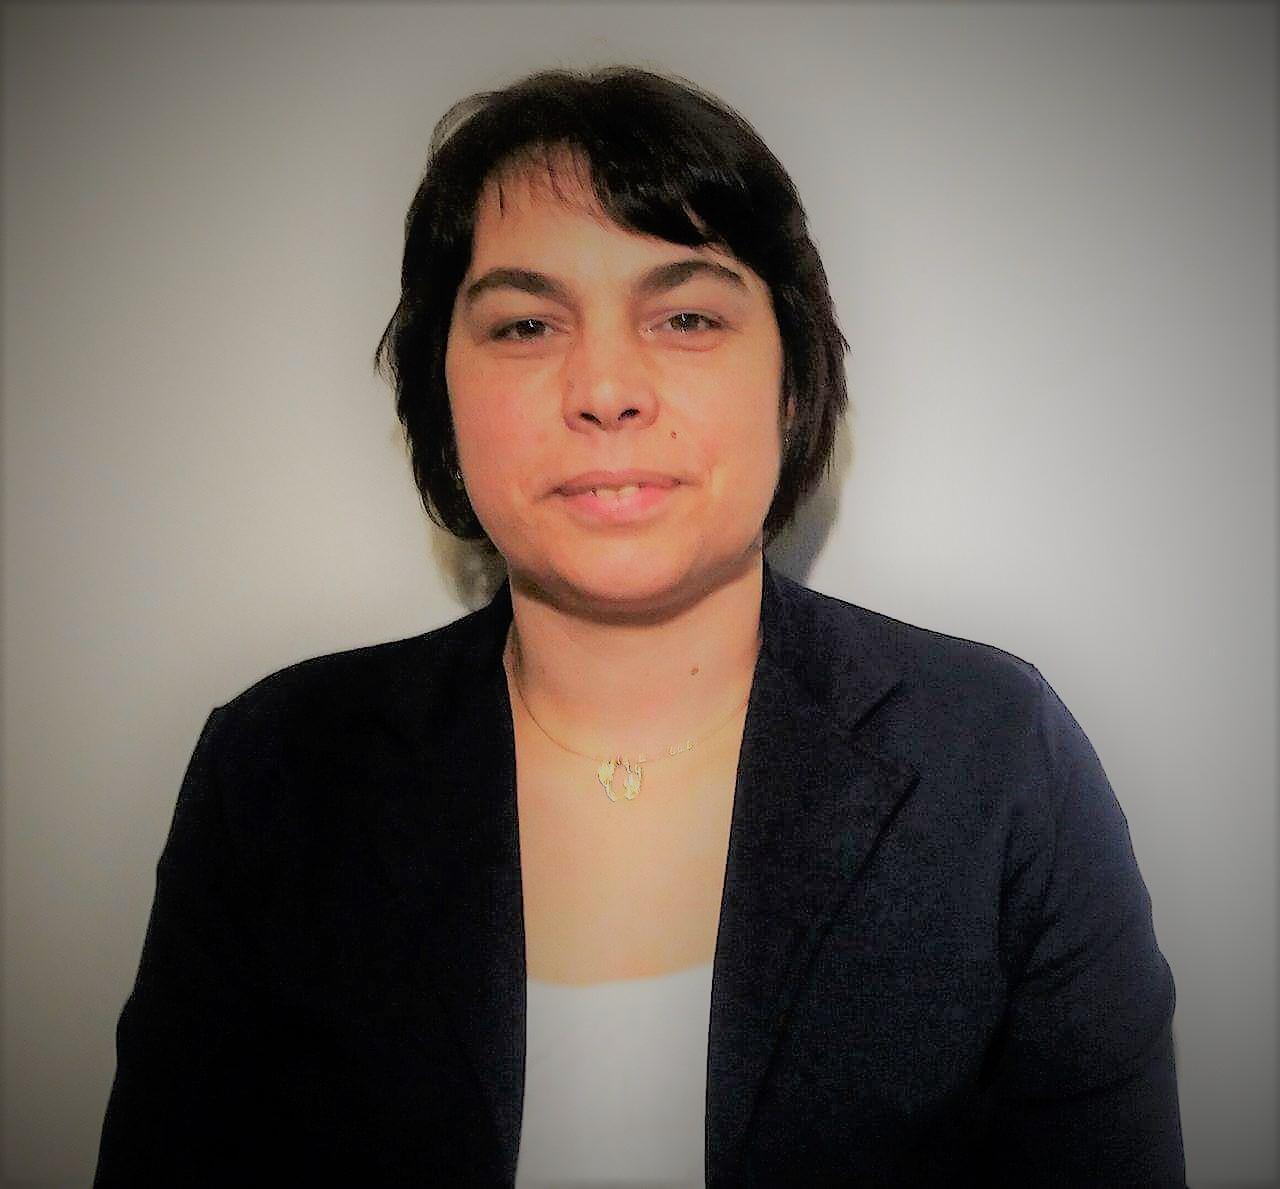 Maria Tolas